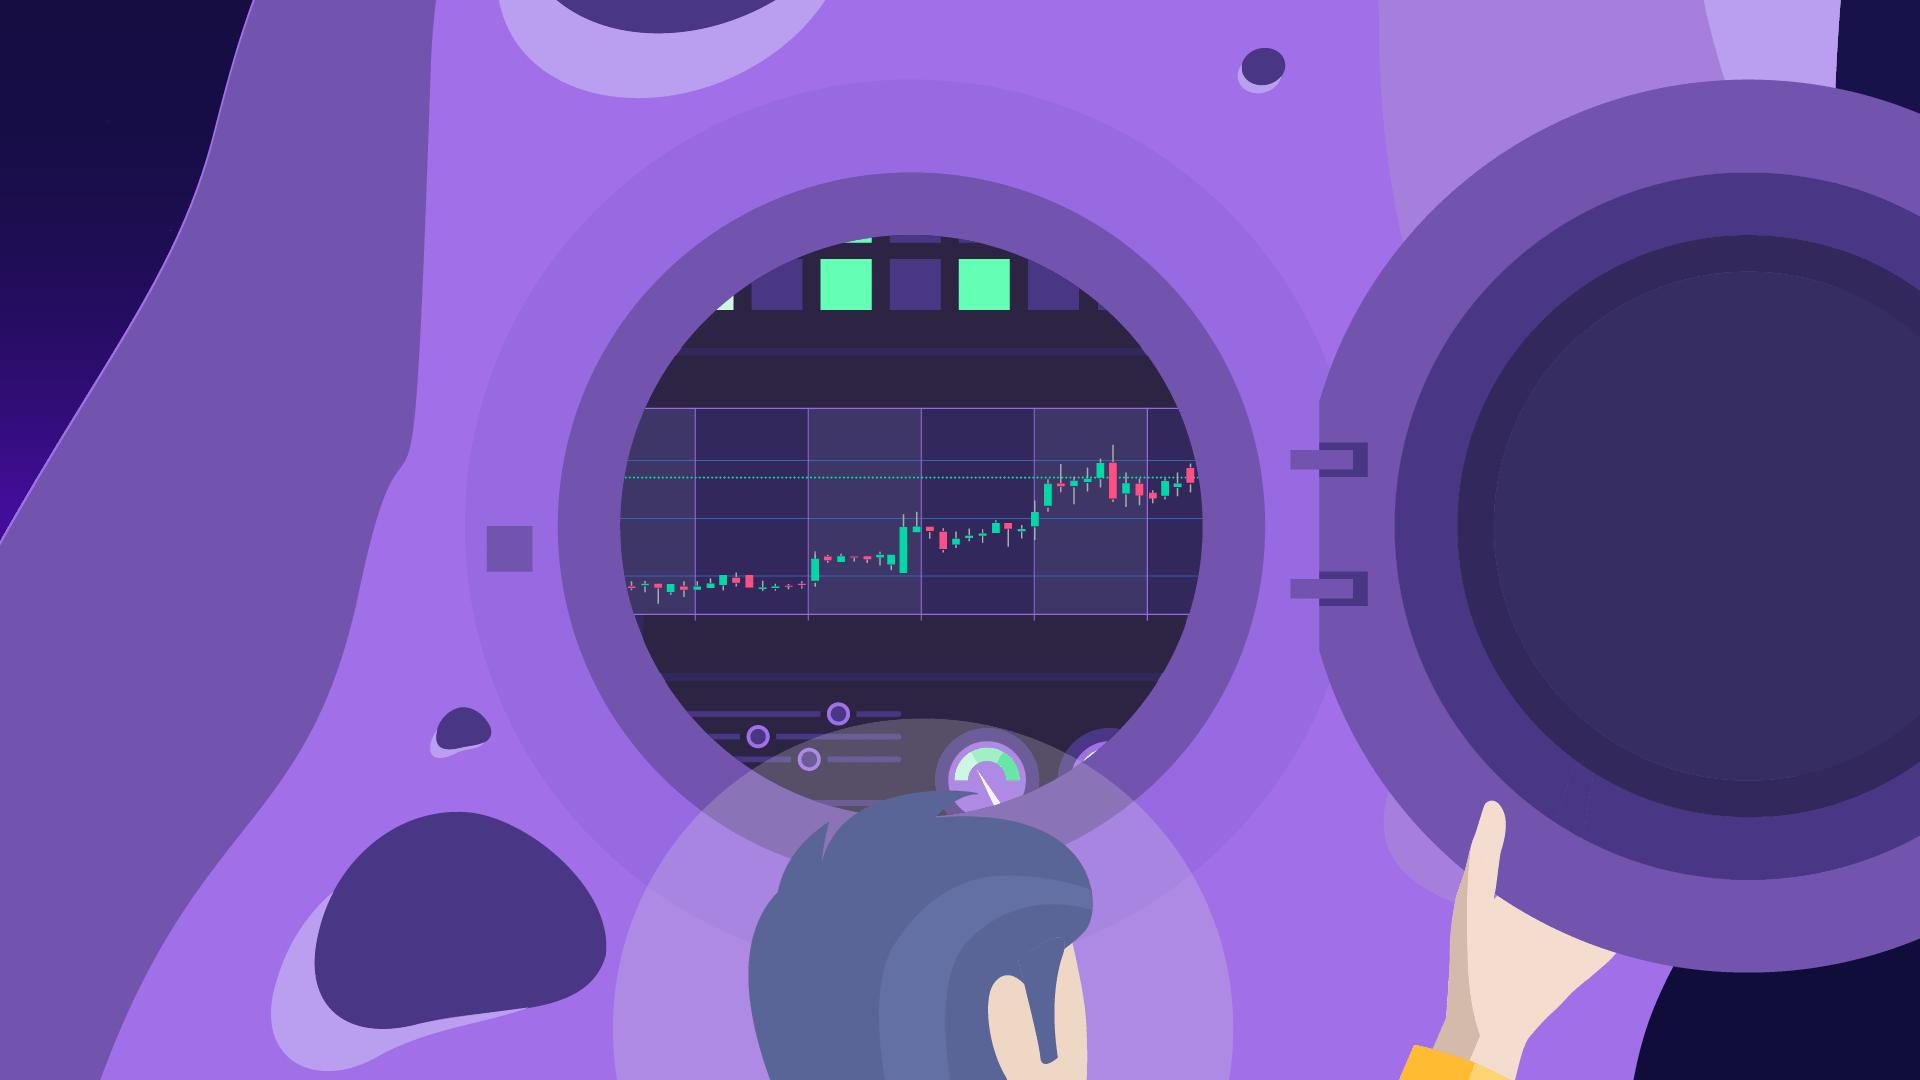 Estabilidade da blockchain